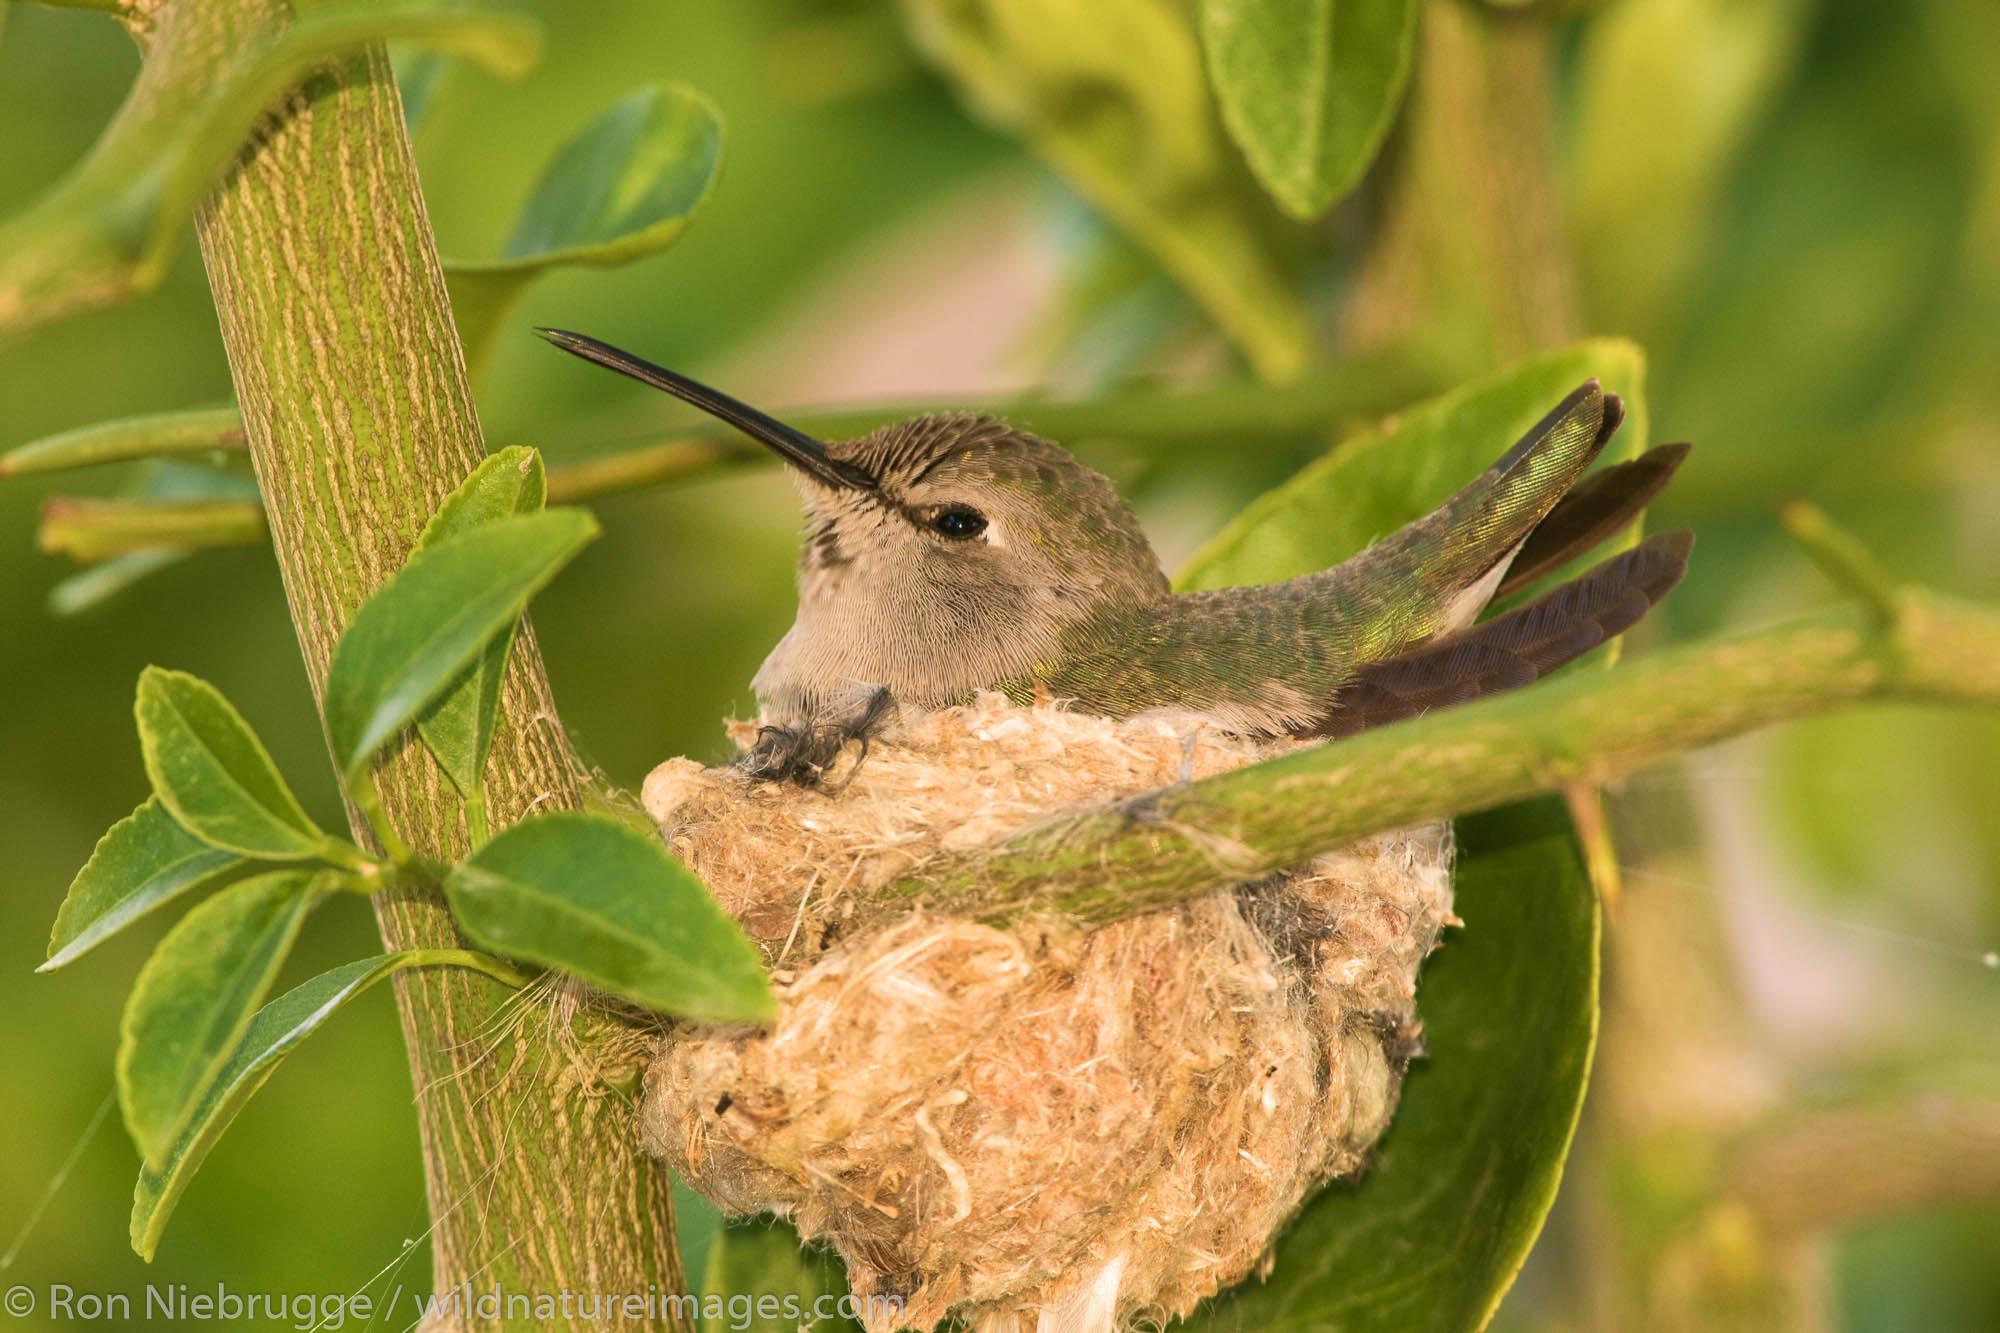 Anna's Hummingbird (Calypte anna) at a nest in Anza-Borrego Desert State Park, California.